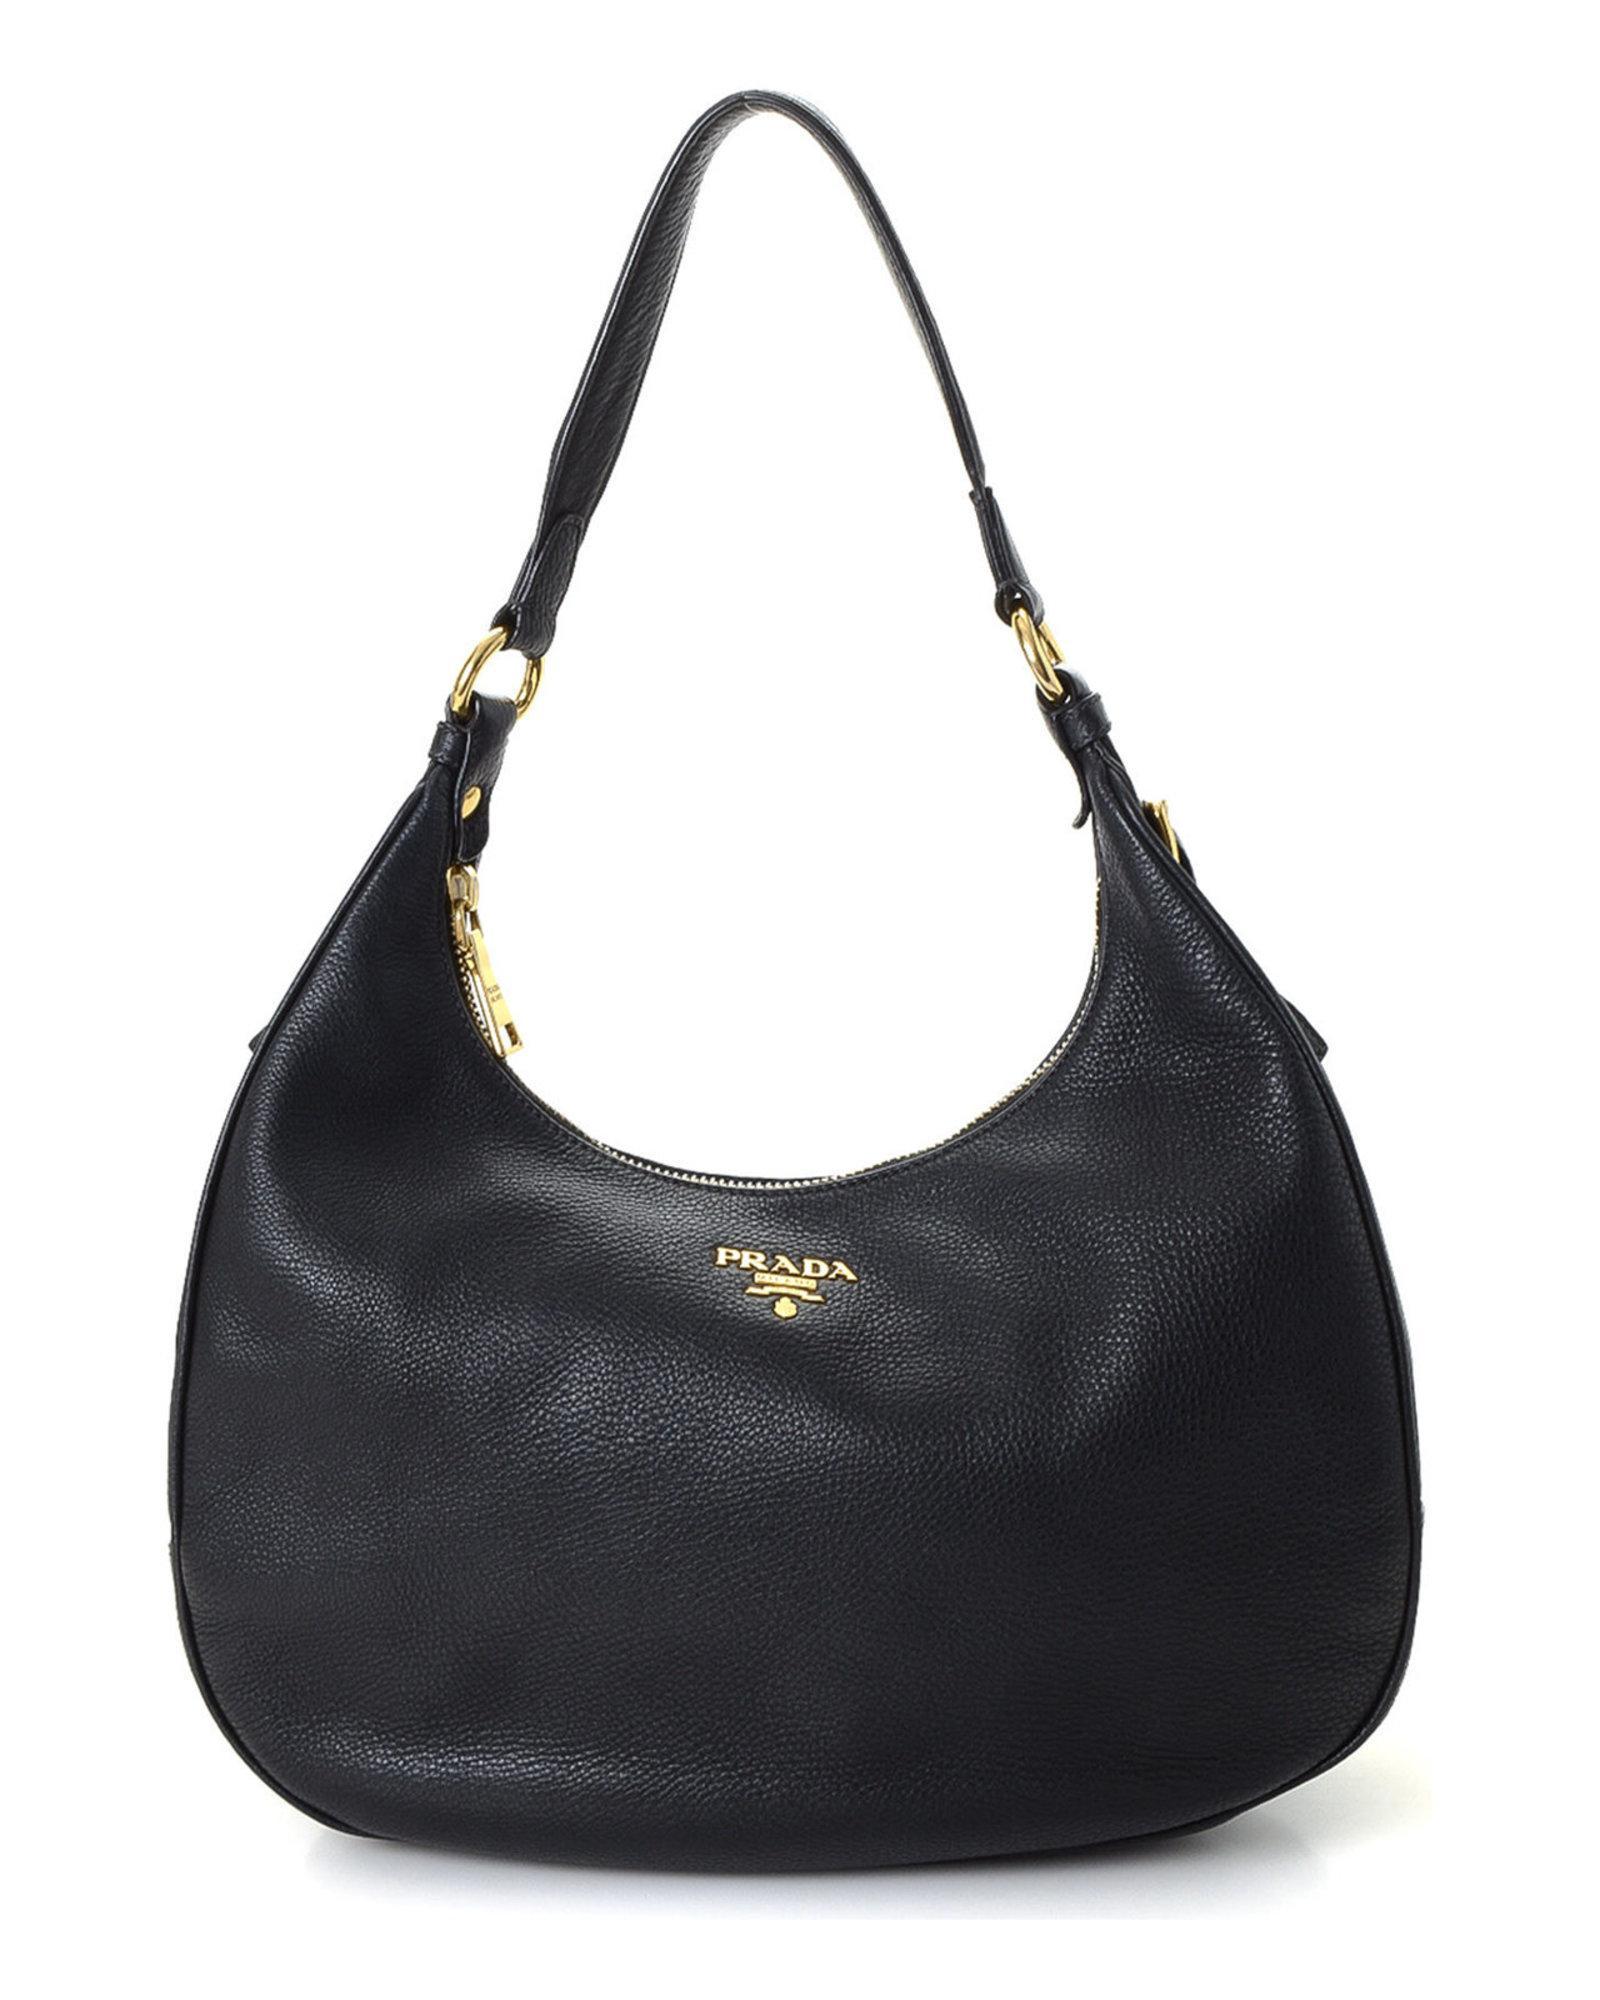 c81b6f2338 Lyst - Prada Vitello Daino Hobo Shoulder Bag - Vintage in Black